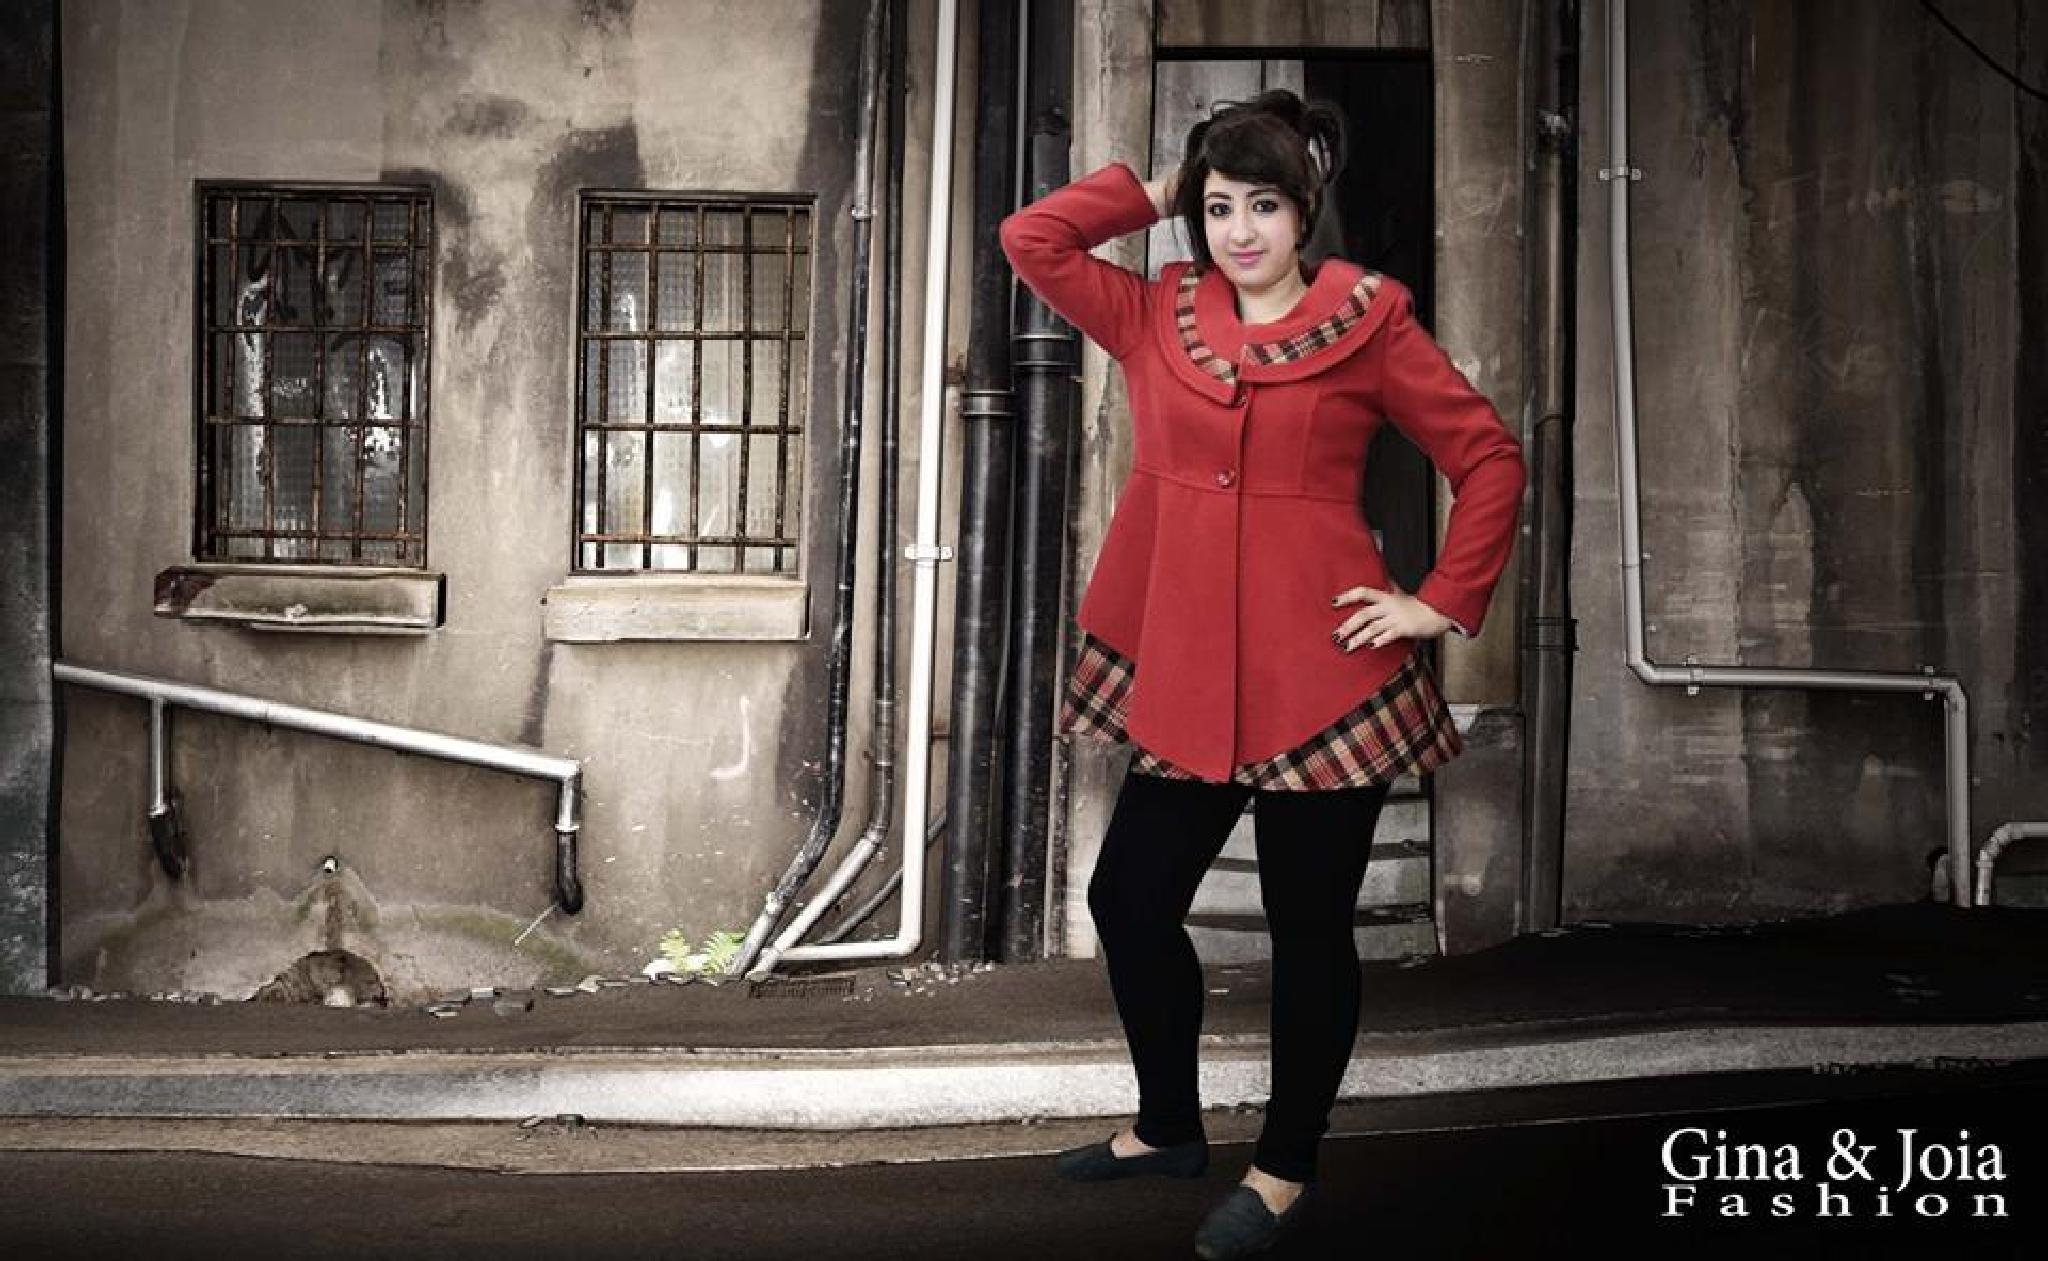 Fashion gina by Amr Hamdi Photographiy